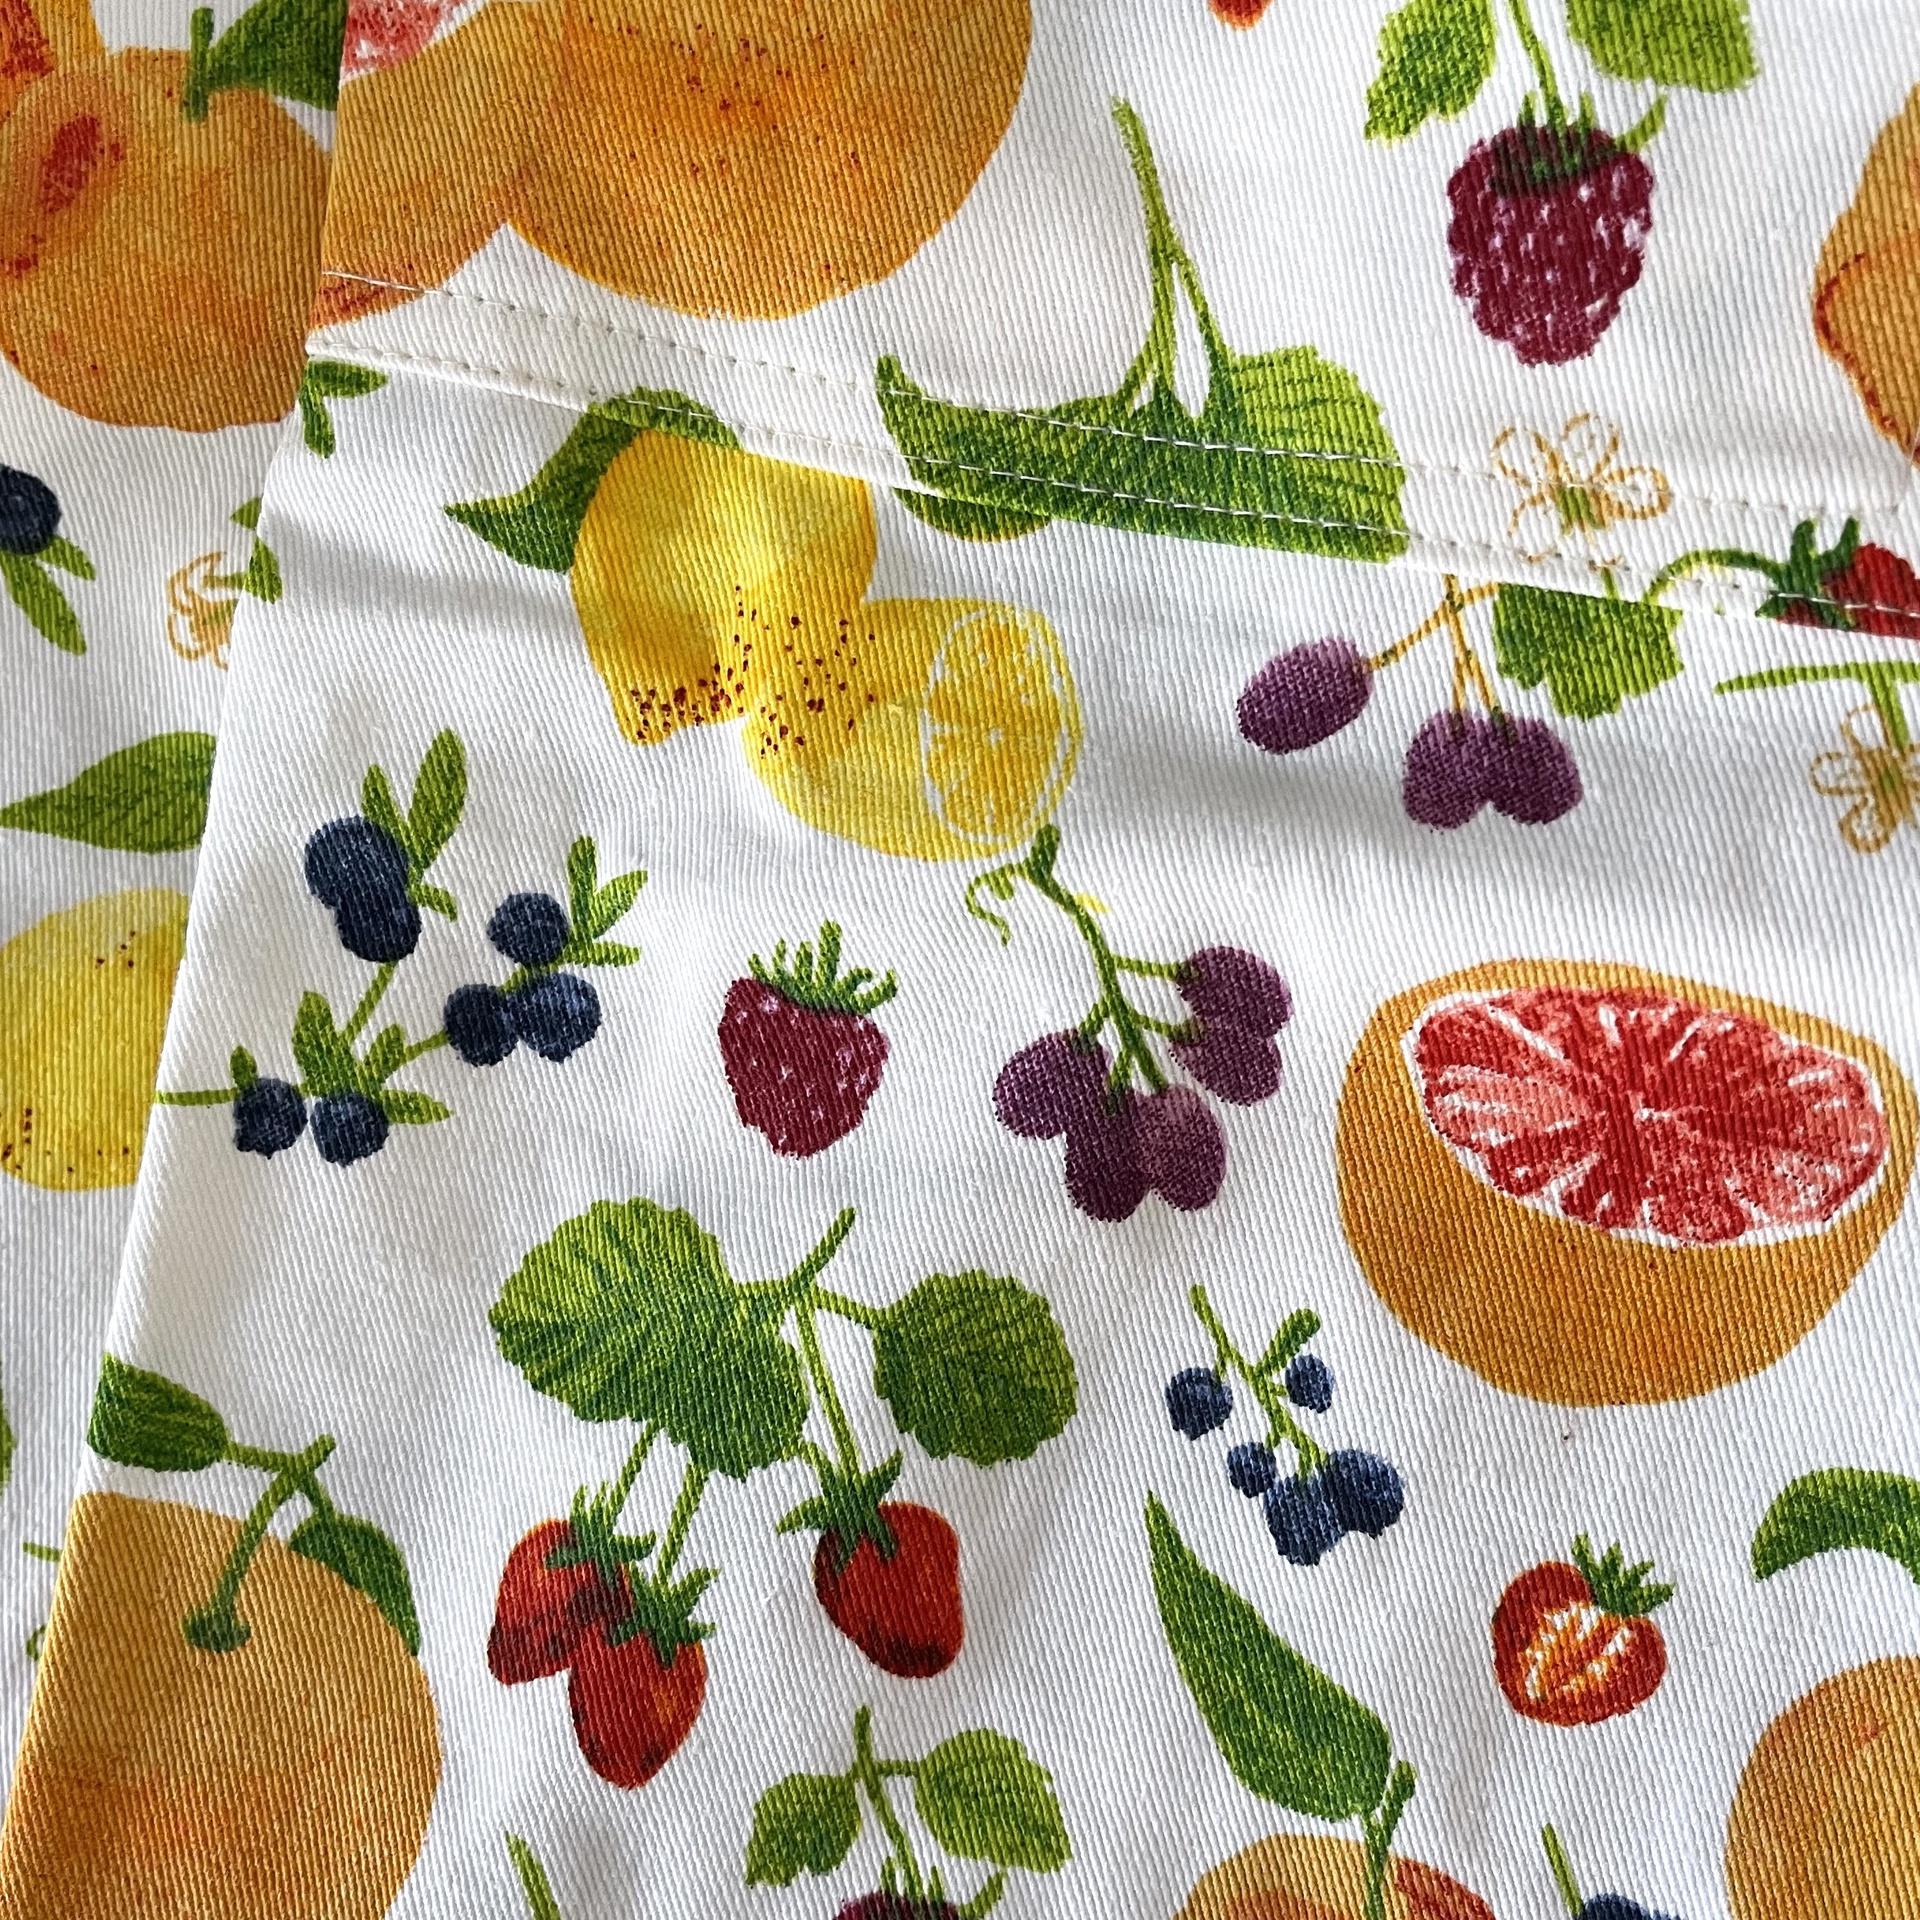 Fruit Salad, Chef Apron